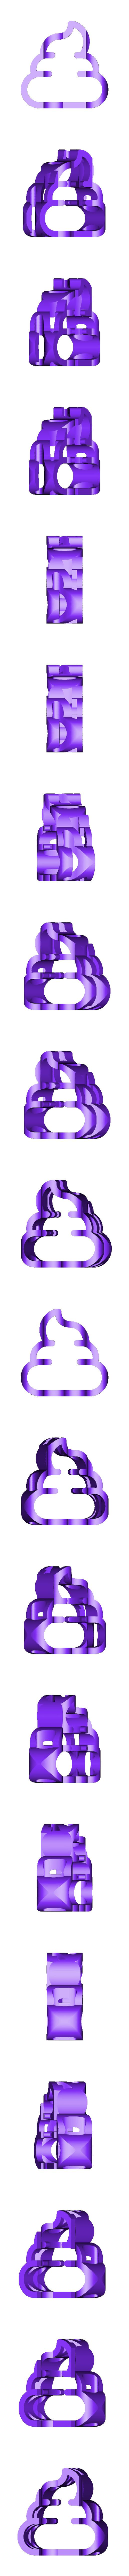 poo2.stl Download free STL file Text Flip - 2020 Poo • 3D printing design, MrP023